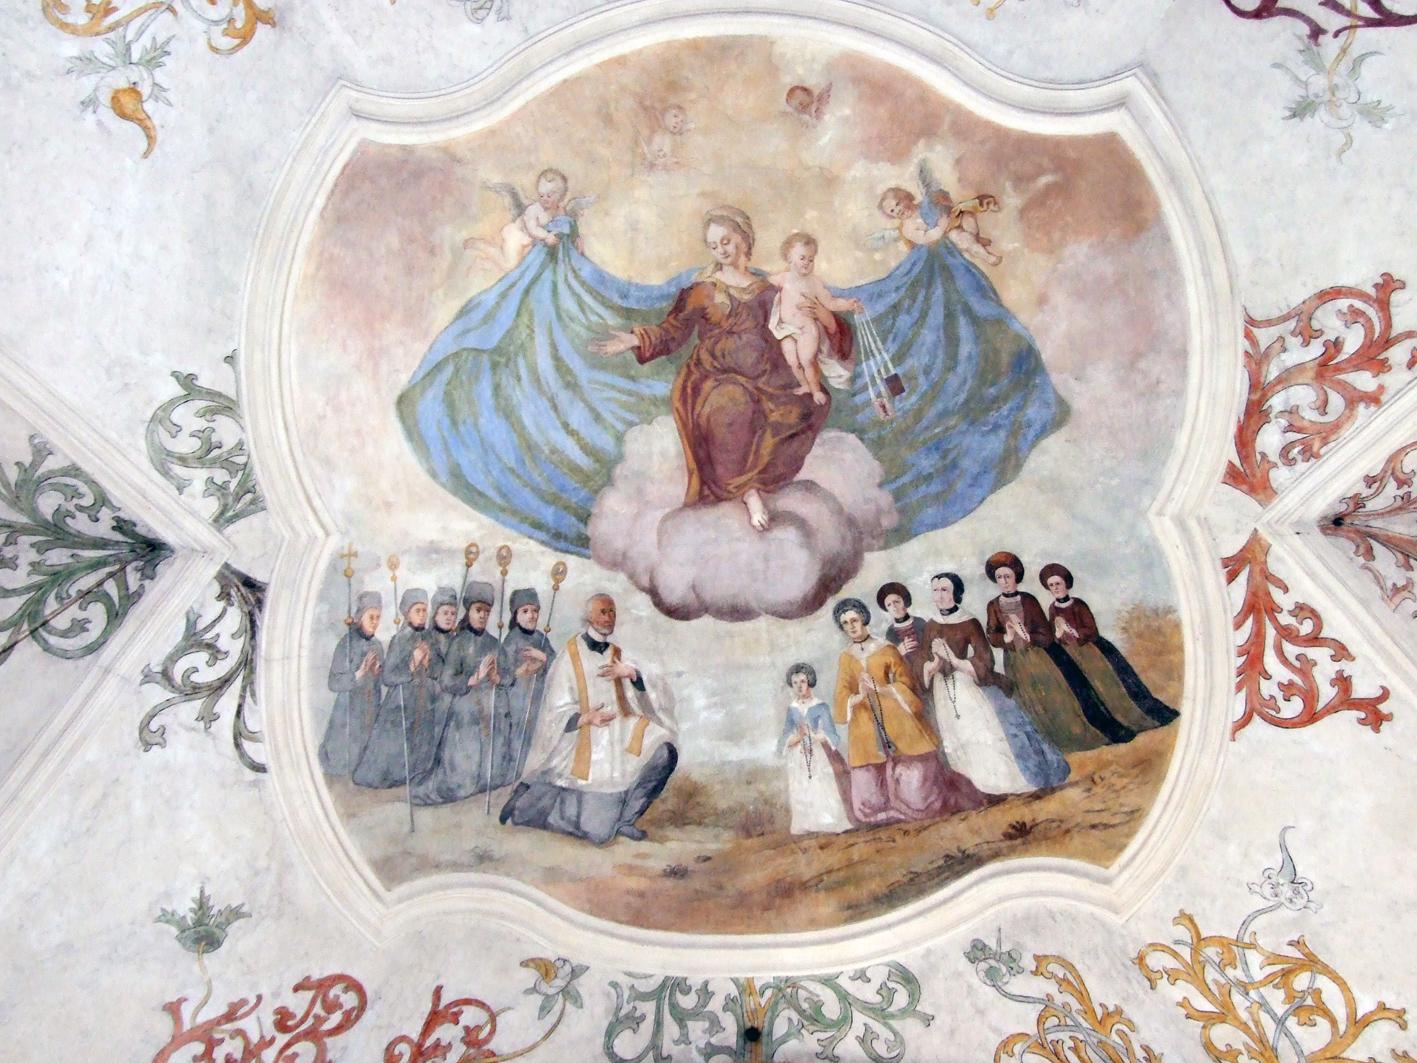 2021 05 17 aoelfb niedergottsau kirche mariae himmelfahrt fresko schutzmantelmadonna